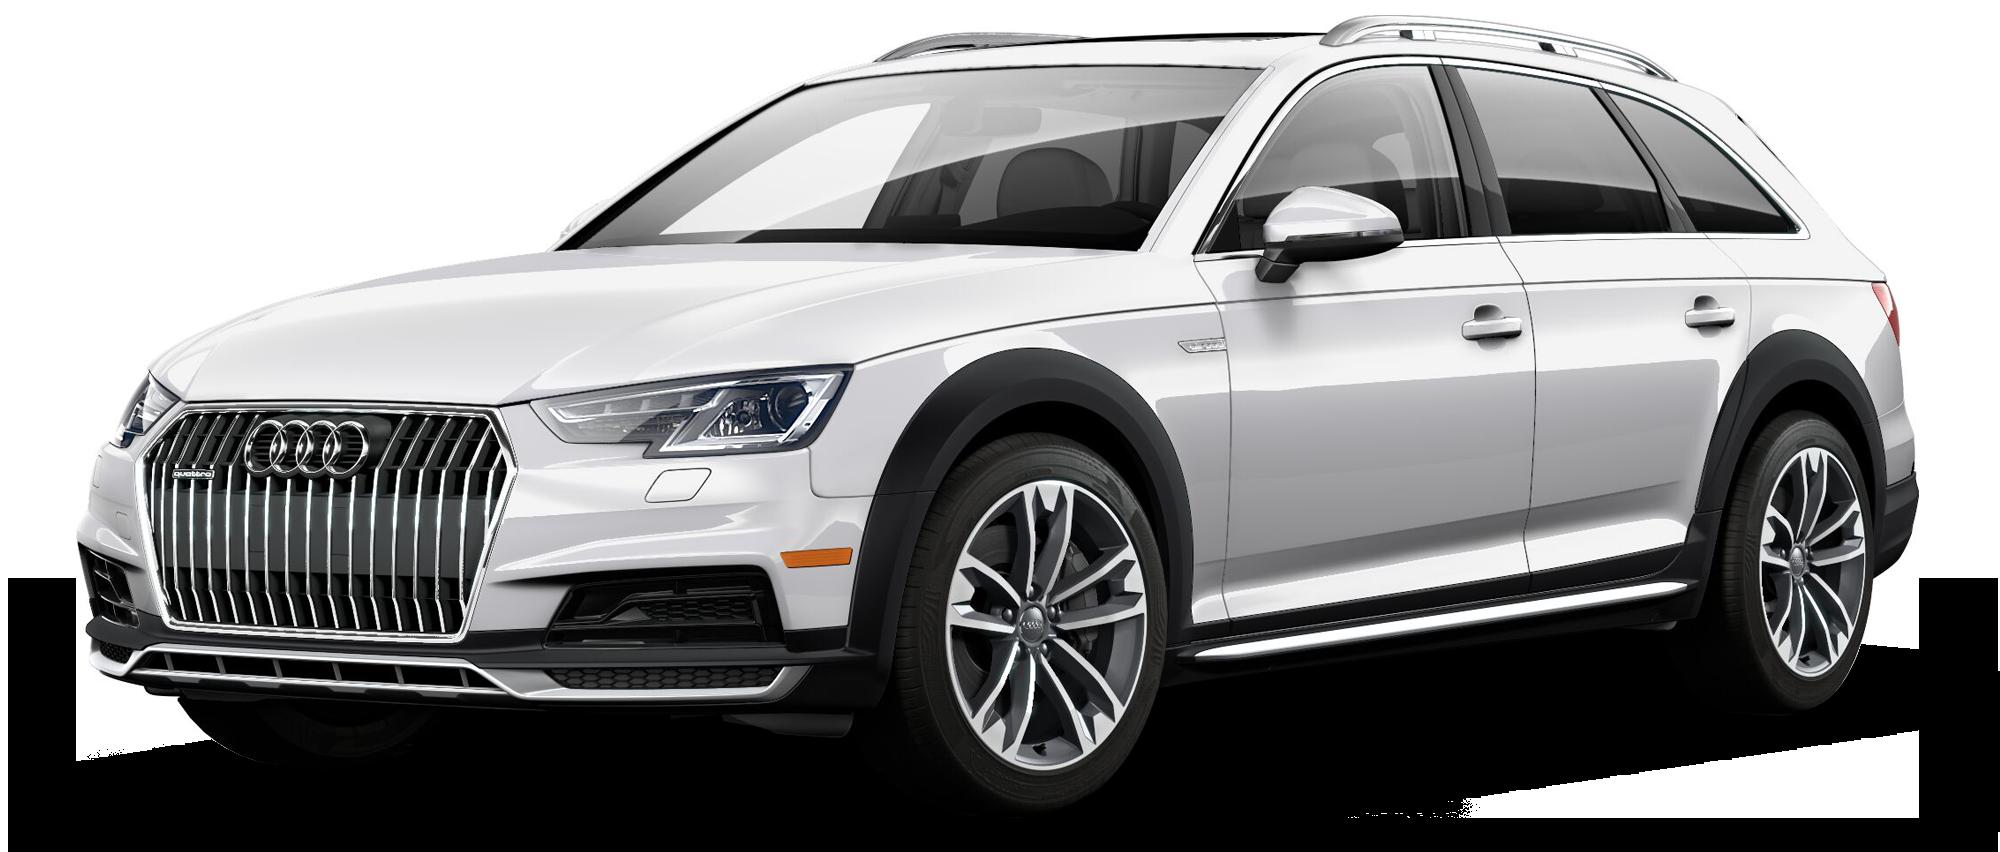 Kekurangan Audi Allroad 2019 Tangguh